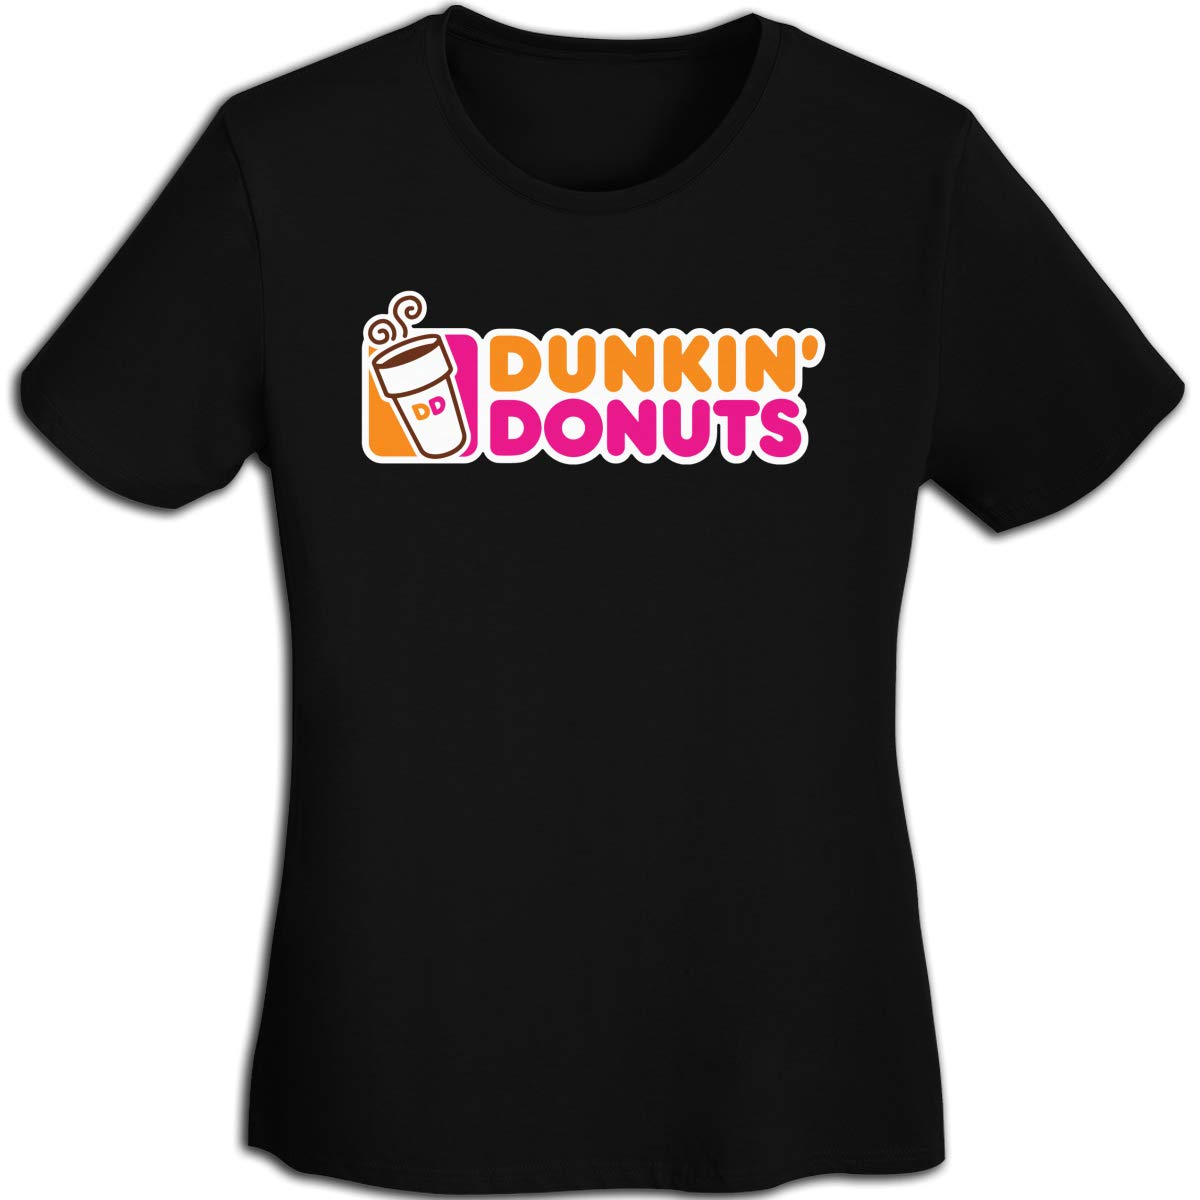 Womens Dunkin Donuts Logo Logo Tee Shirts Short Sleeve T Shirt for Women Tshirt Clothes